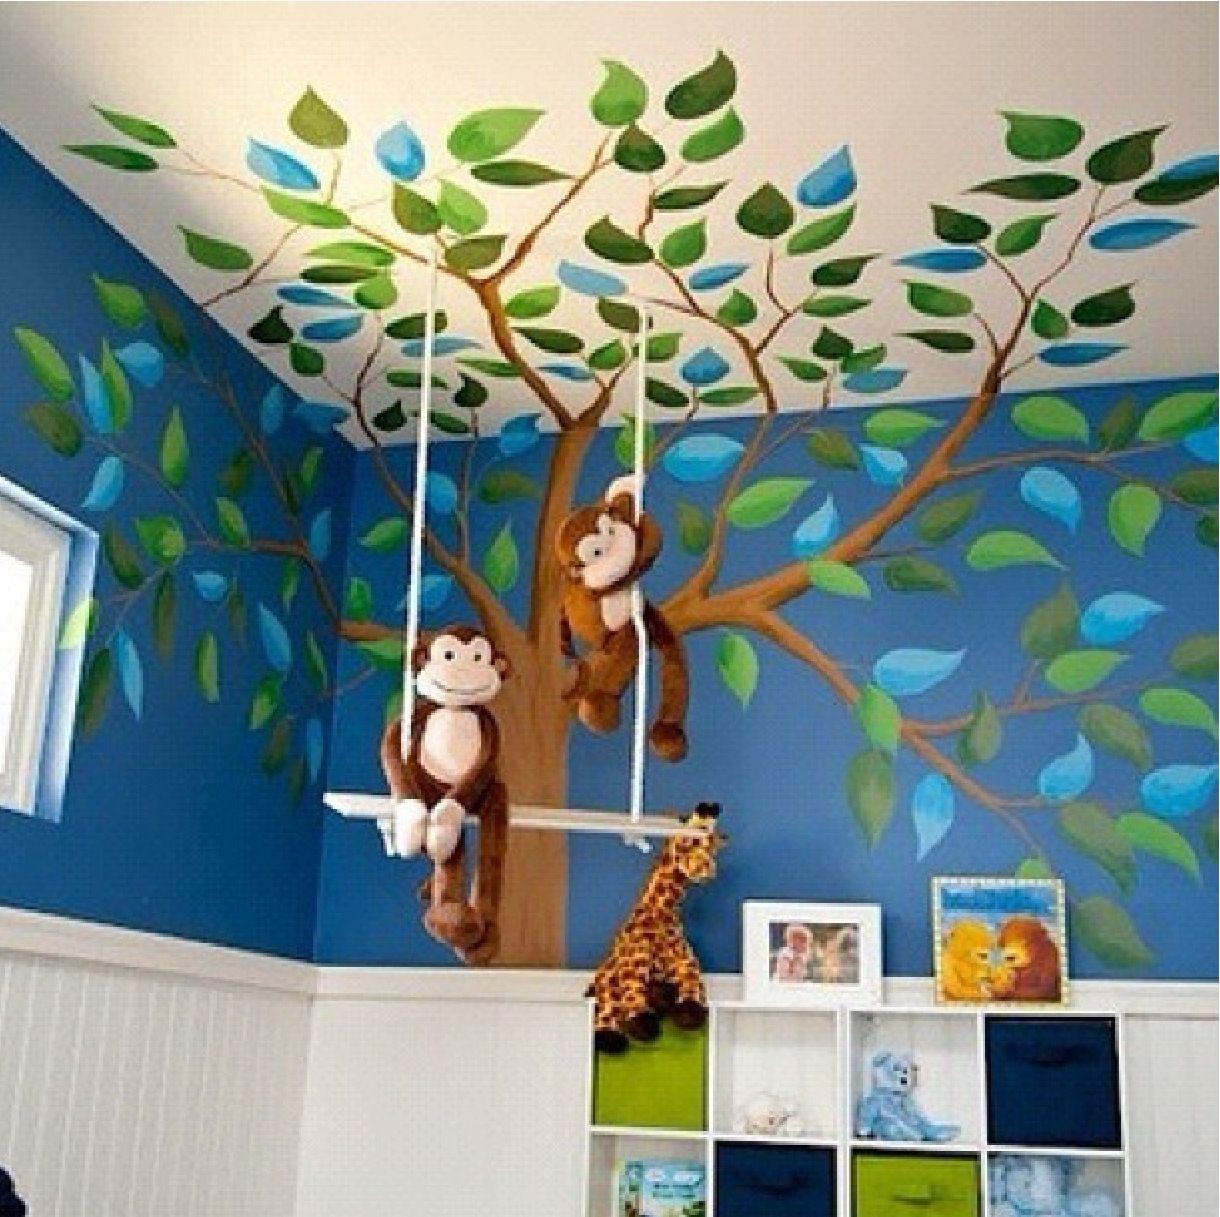 Monkey Business Nursery Jungle Room Jungle Theme And Jungles - Home daycare design ideas